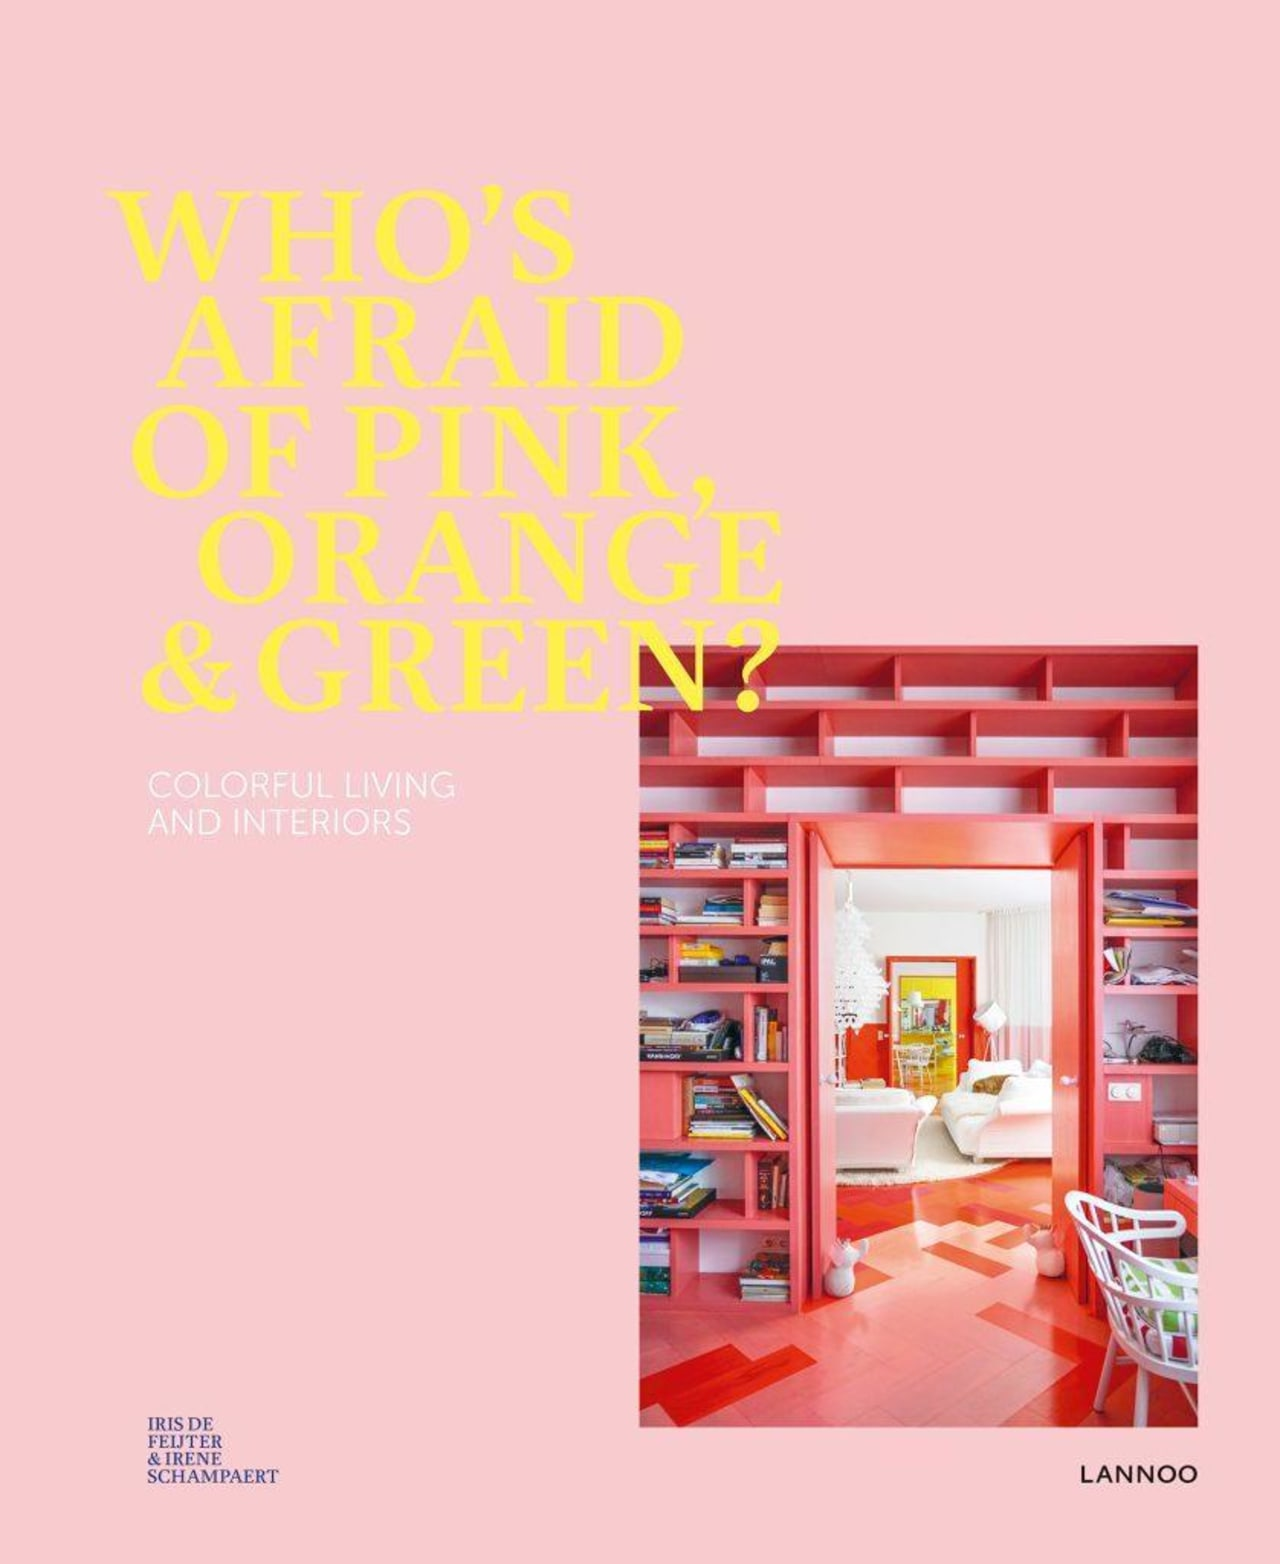 Who's Afraid of Pink, Orange & Green is architecture, design, furniture, graphic design, illustration, interior design, line, orange, pink, product, red, room, shelf, text, pink